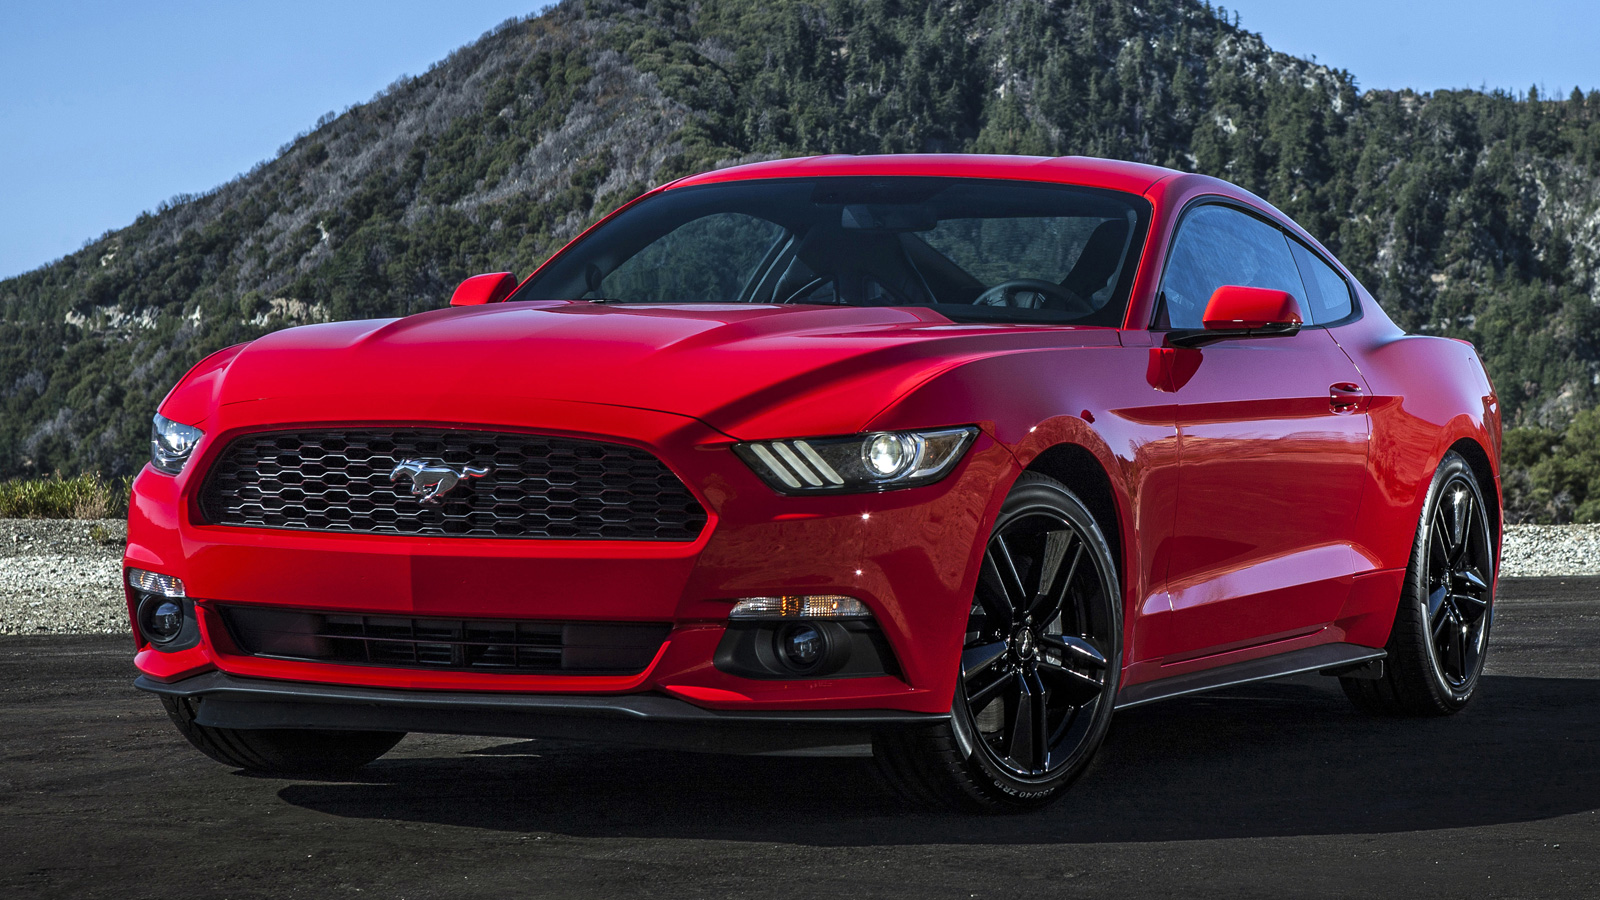 Ford Mustang 2016 2017 цены и характеристики фотографии